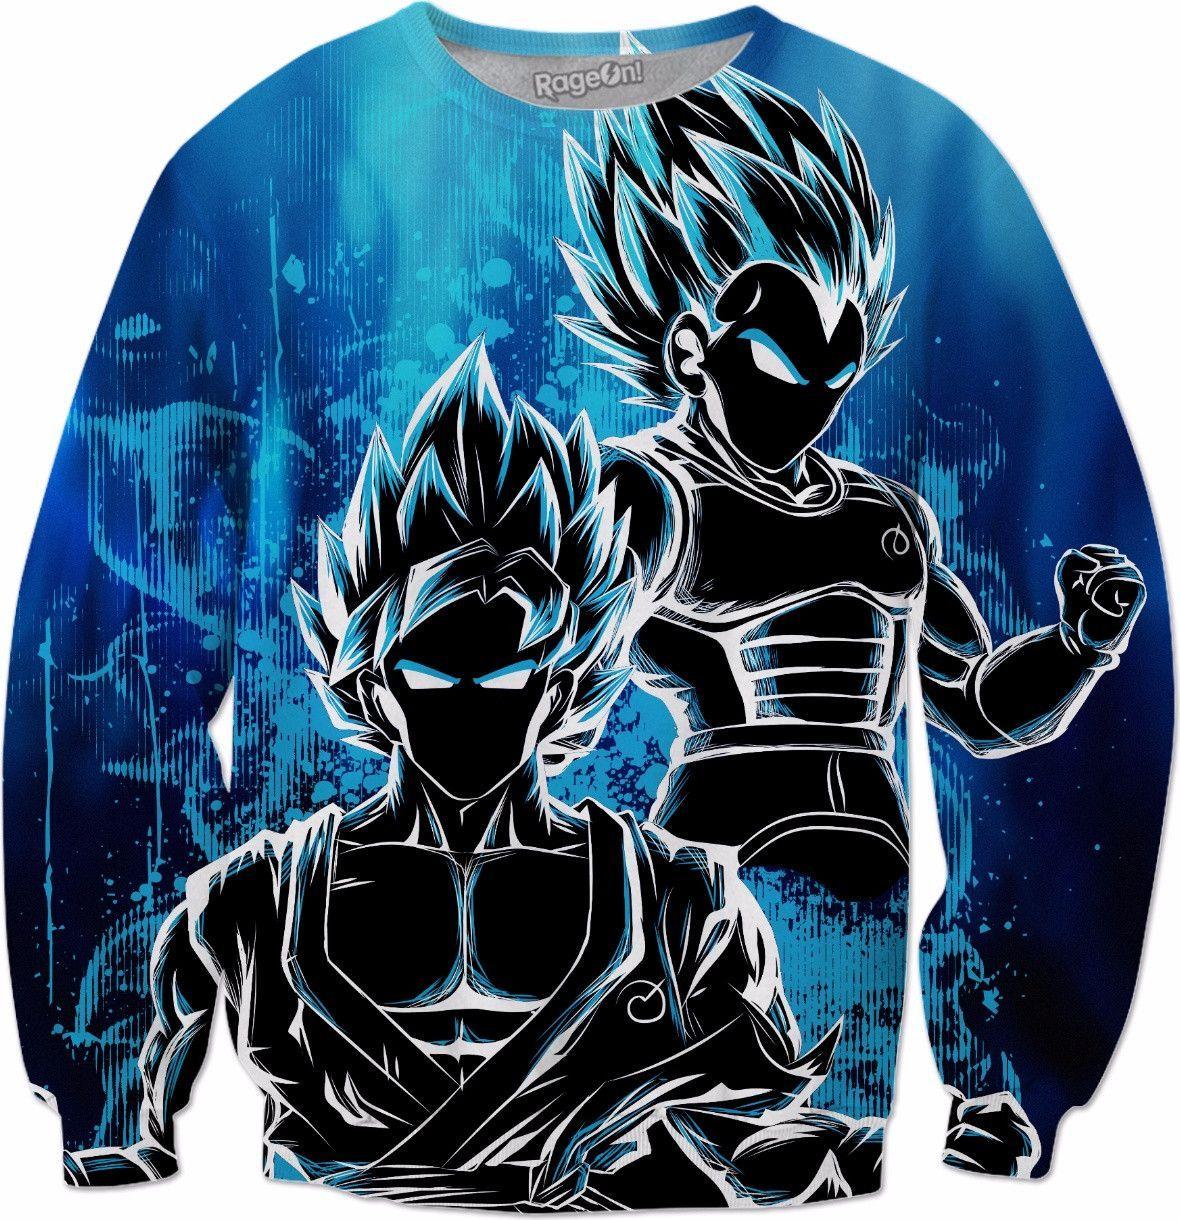 78759dad SSj God Blue - All Over Print Sweatshirt - TL00950AS | Cool ...